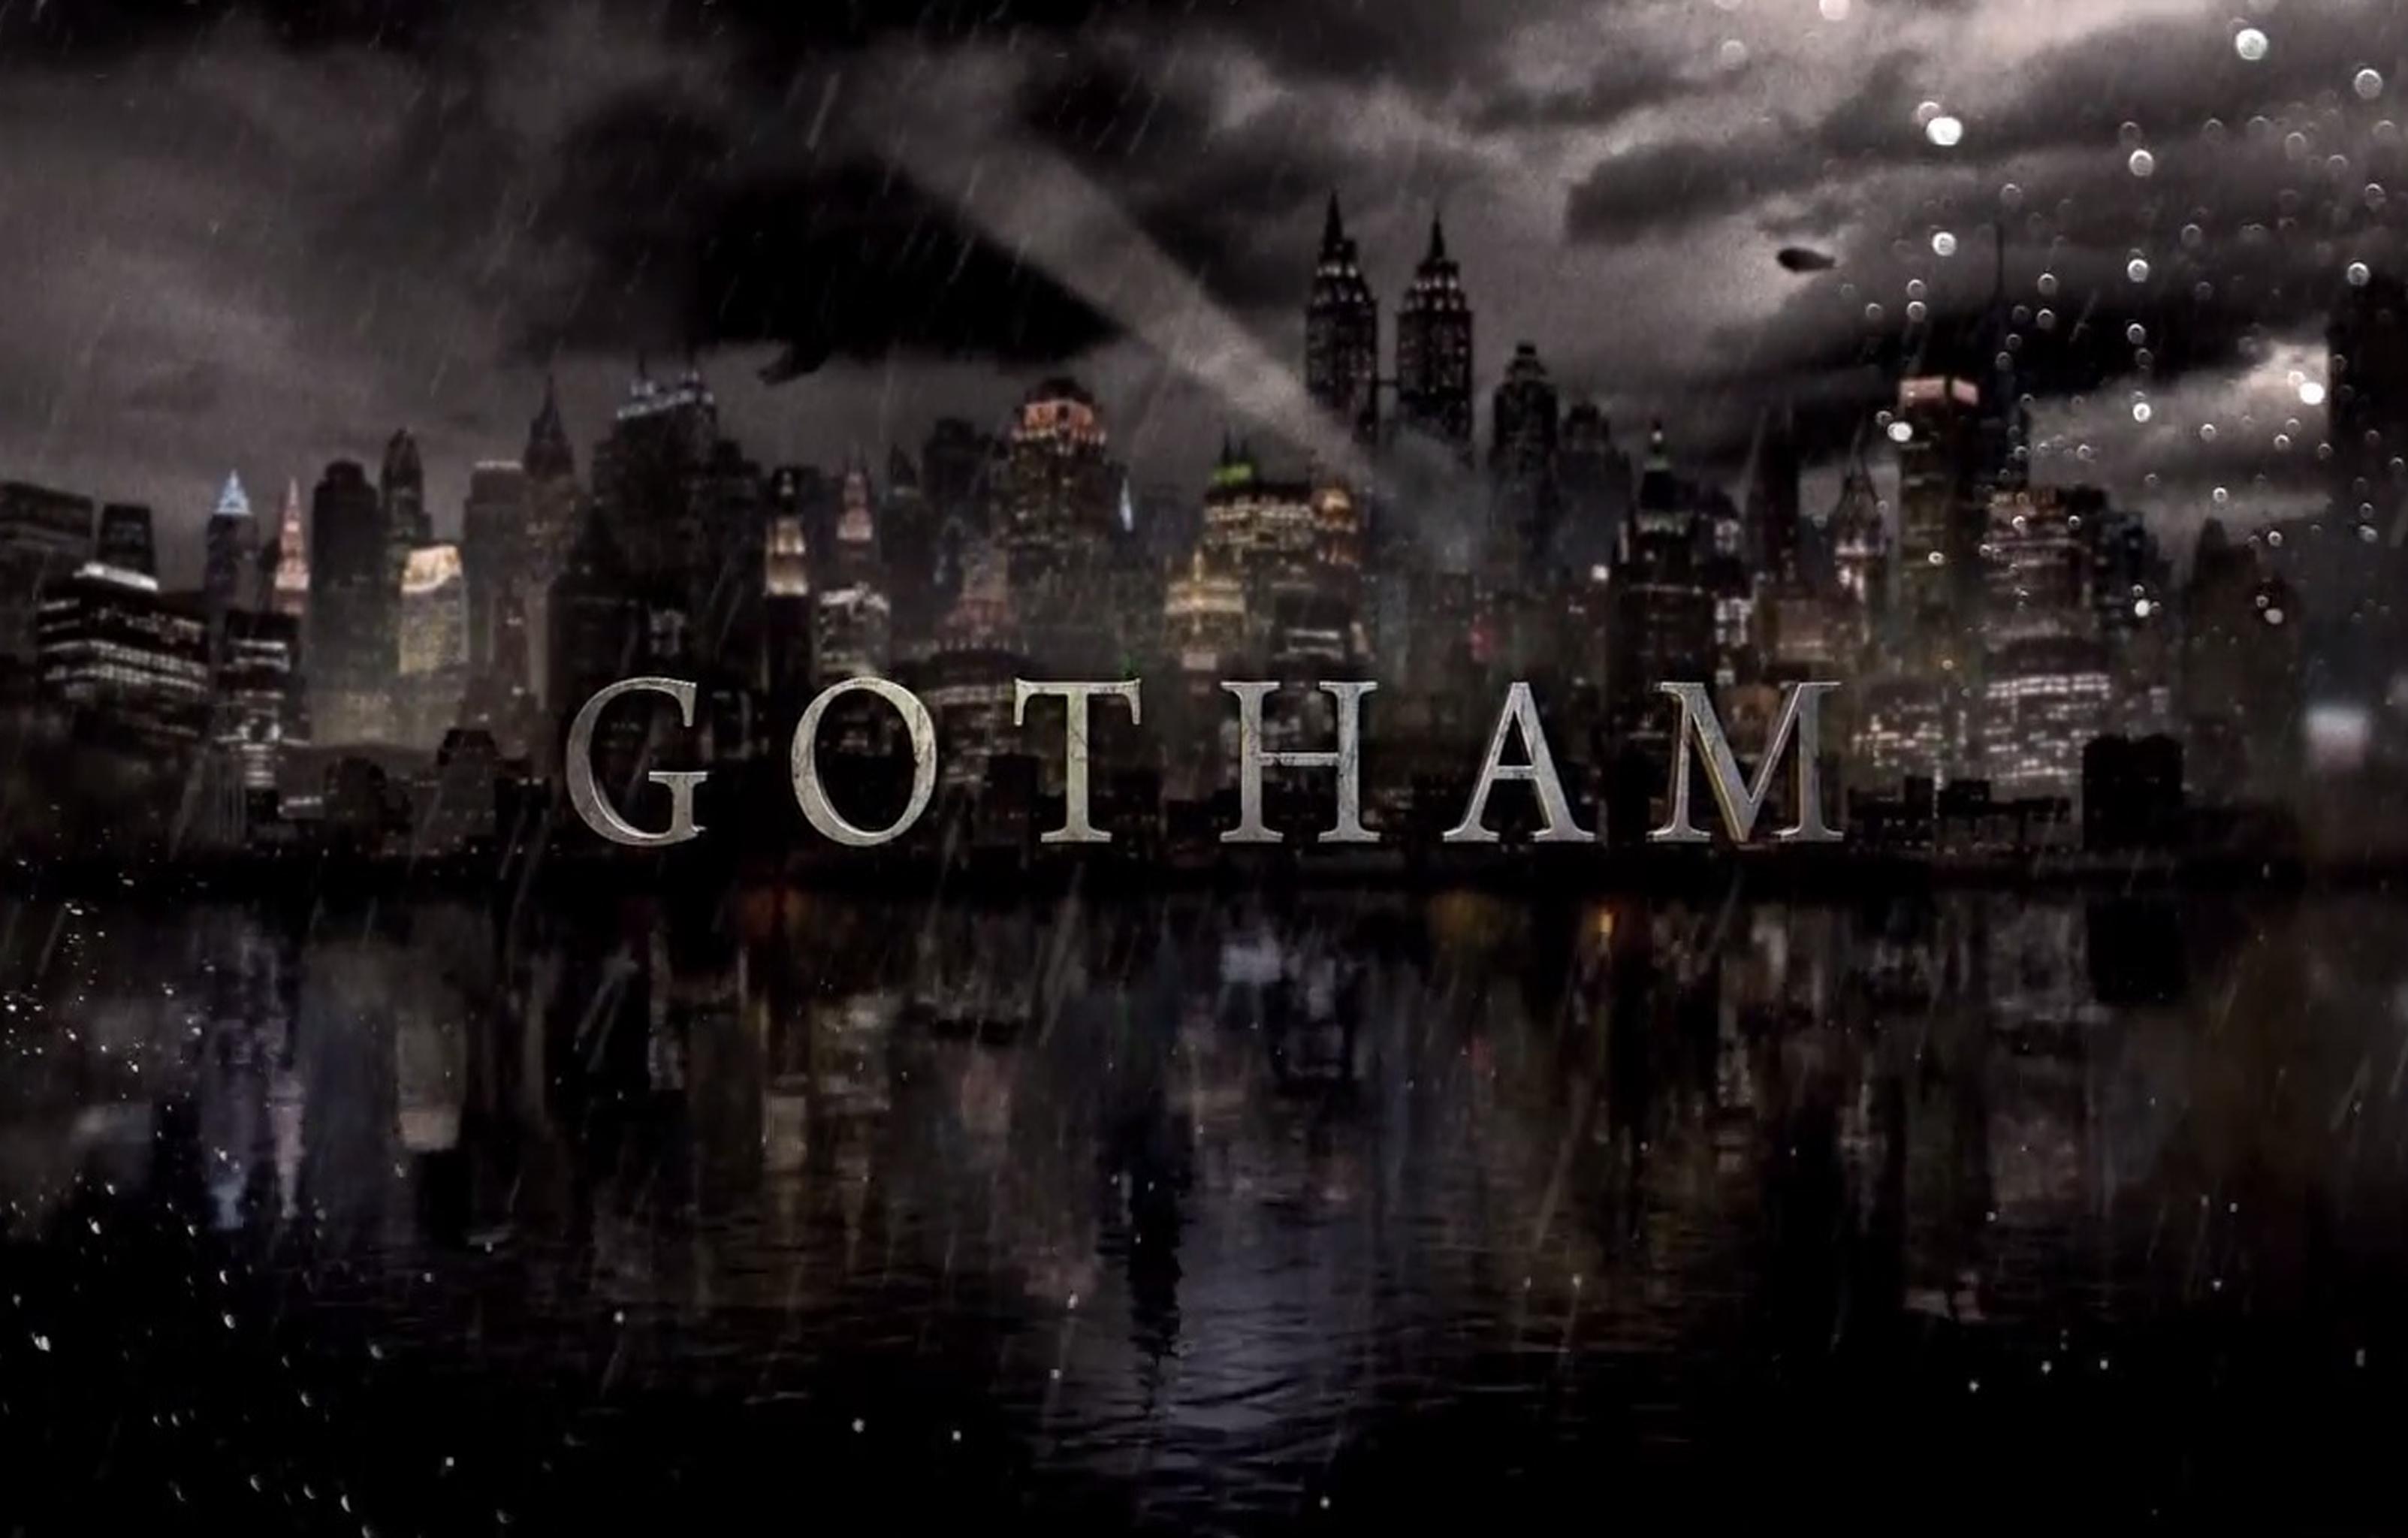 Gotham wallpaper 1 3206x2048